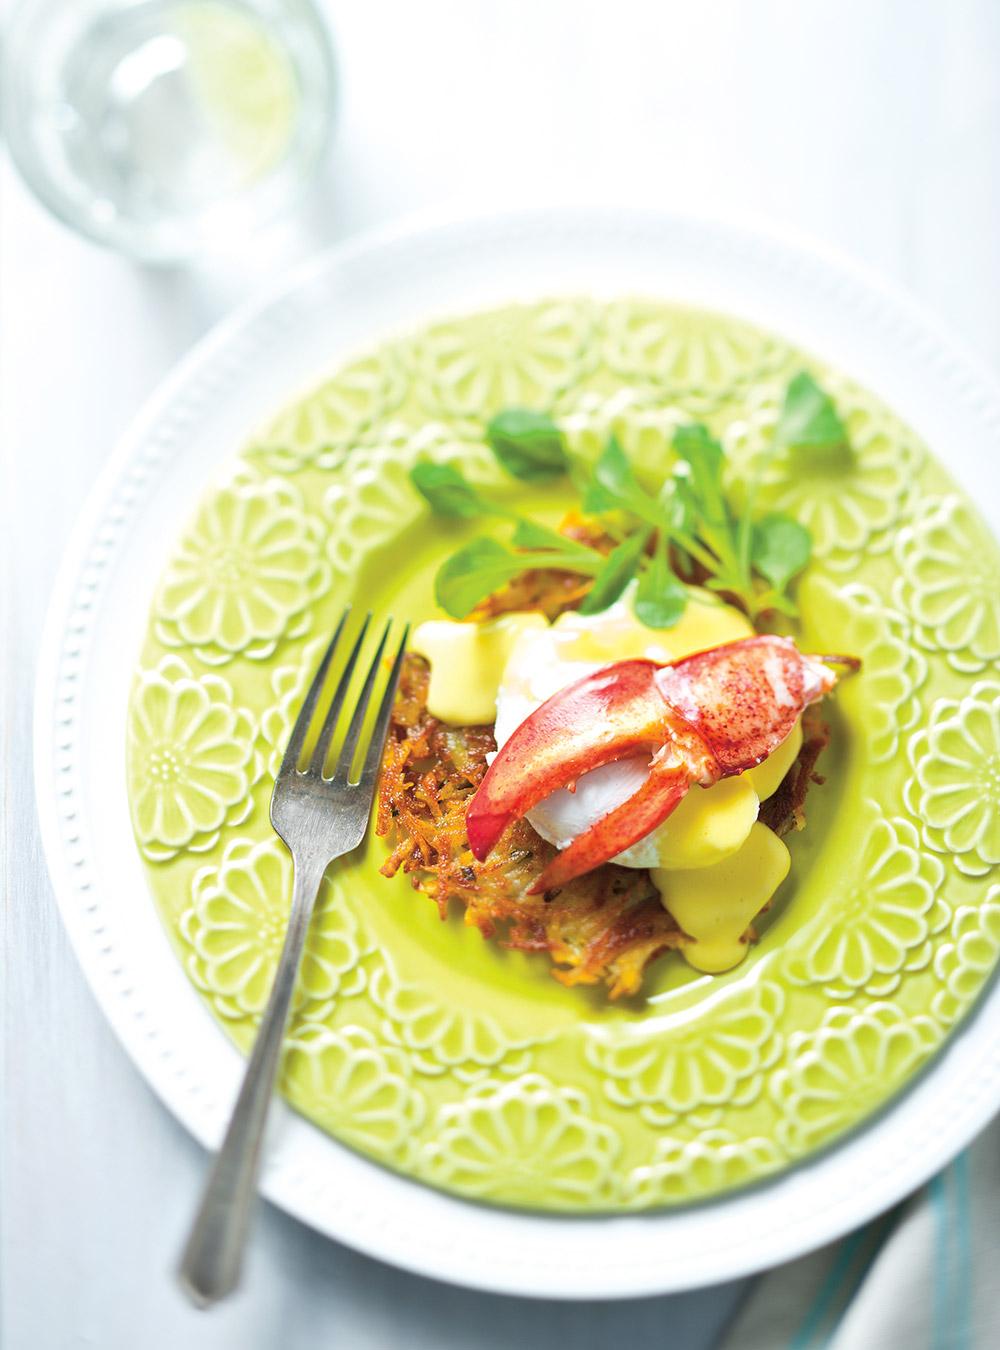 Oeufs bénédictine au homard sur röstis | ricardo